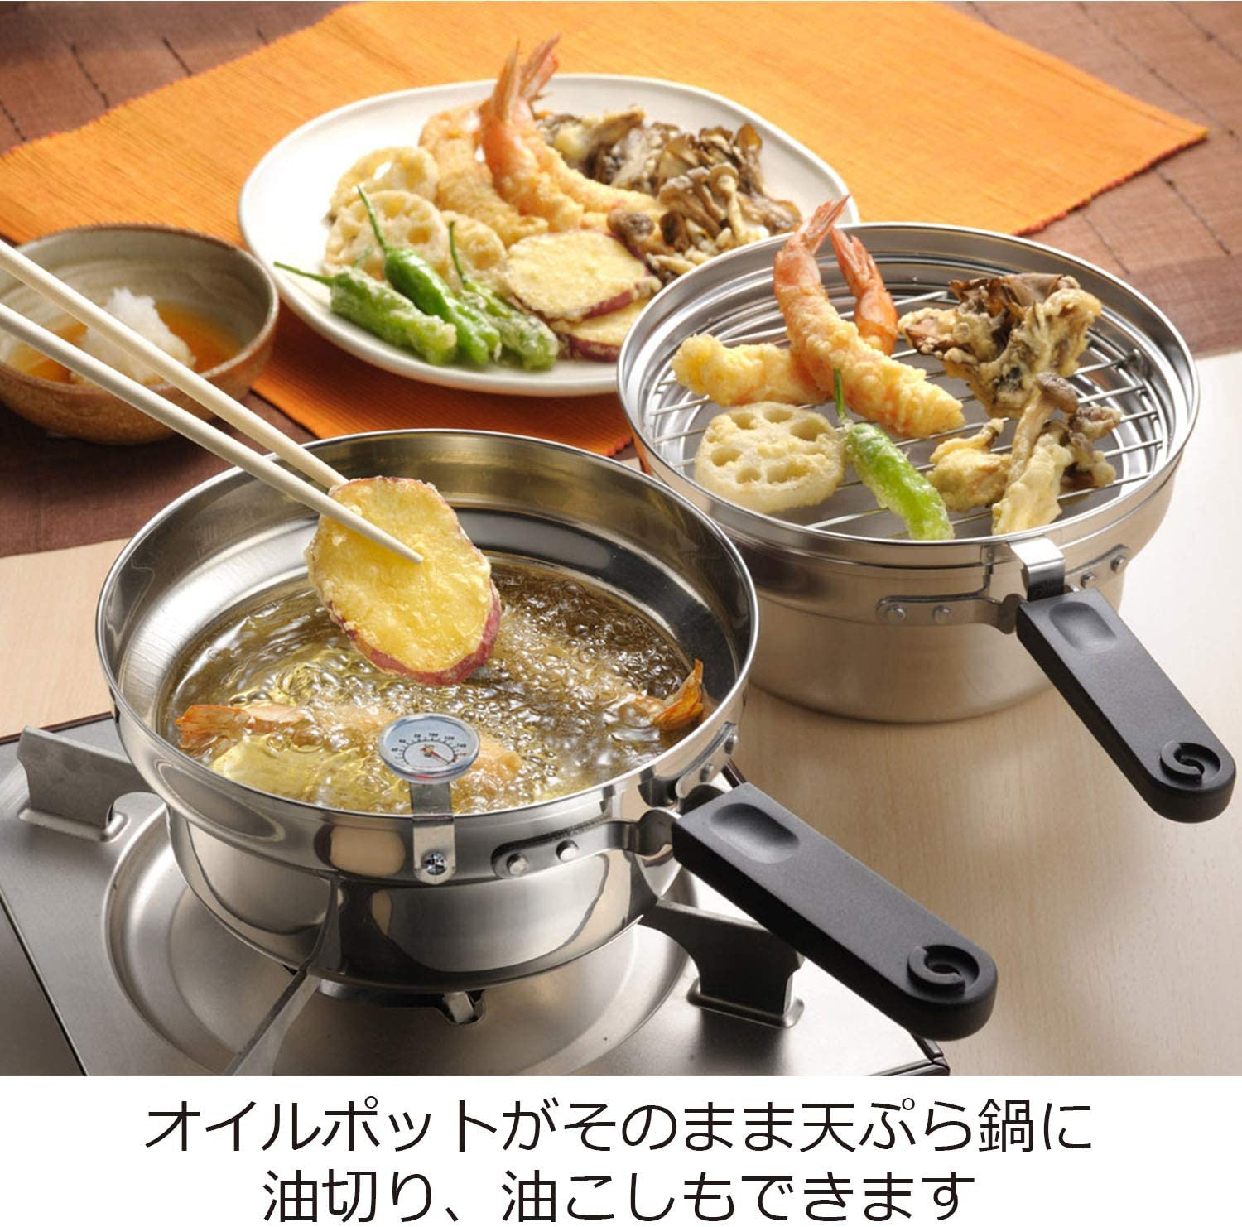 AUX(オークス)日本製 IH対応 片付け簡単 天ぷら鍋セット オイルポット 温度計付 シルバー T23の商品画像2